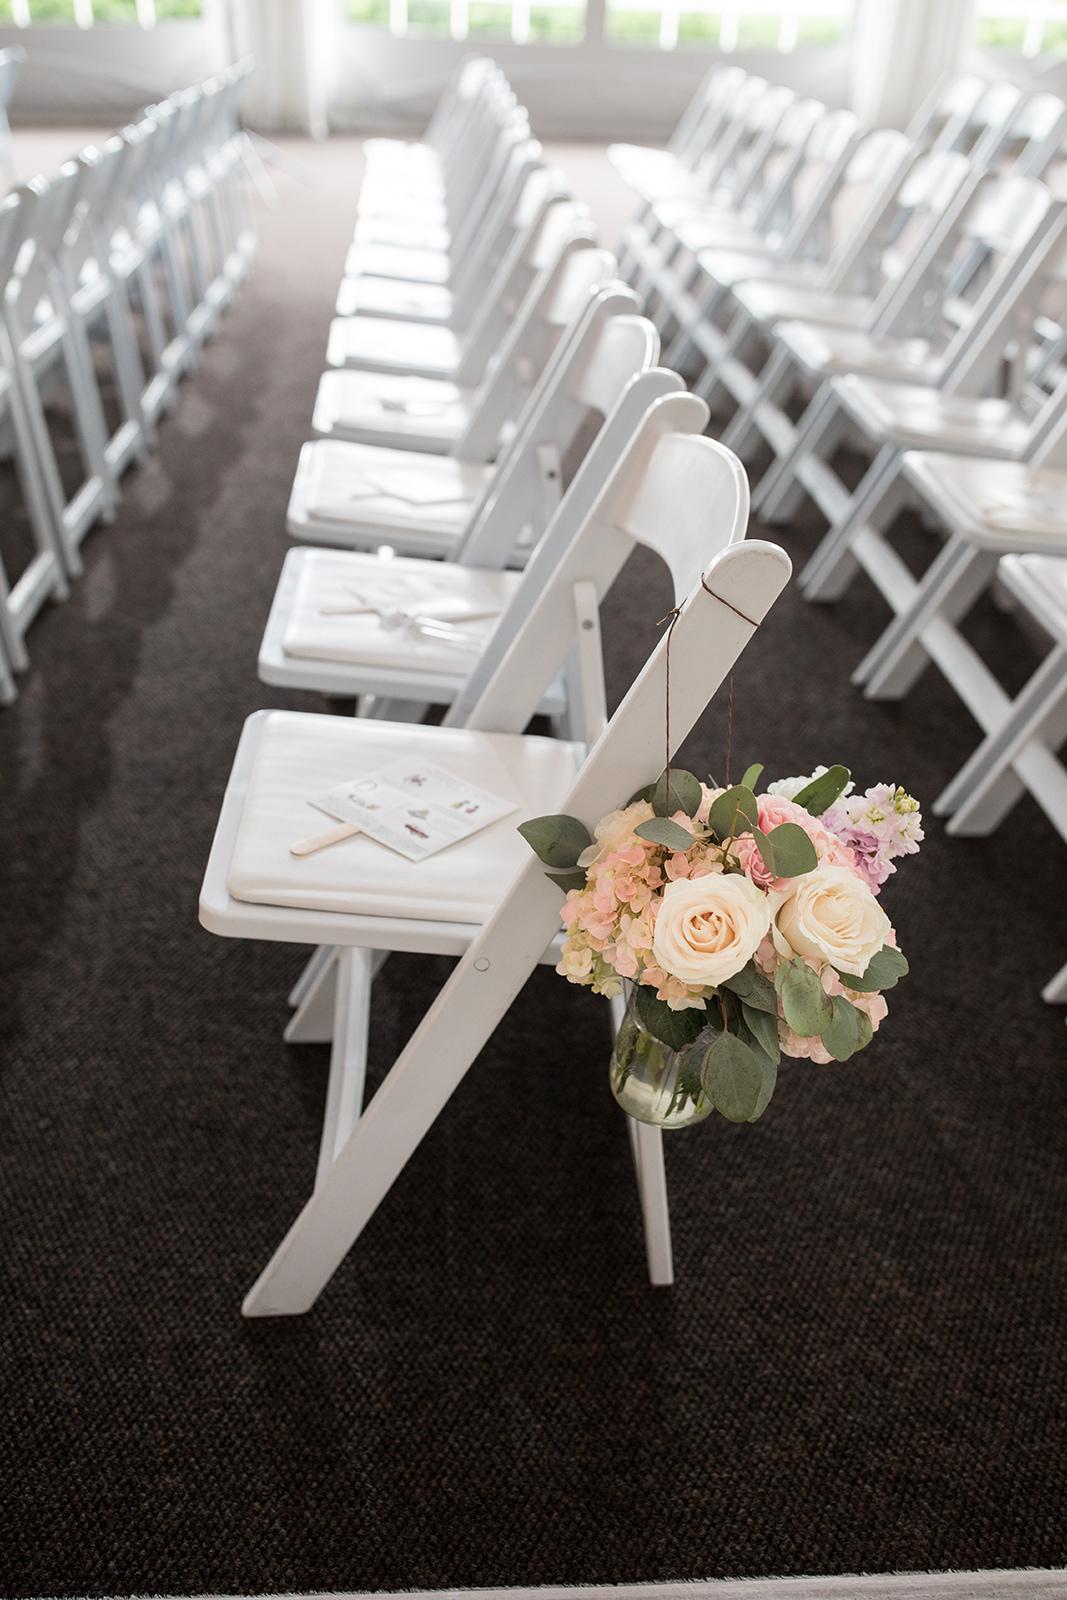 Le Cape Weddings - Sumeet and Chavi - Detalis Ceremony --1.jpg